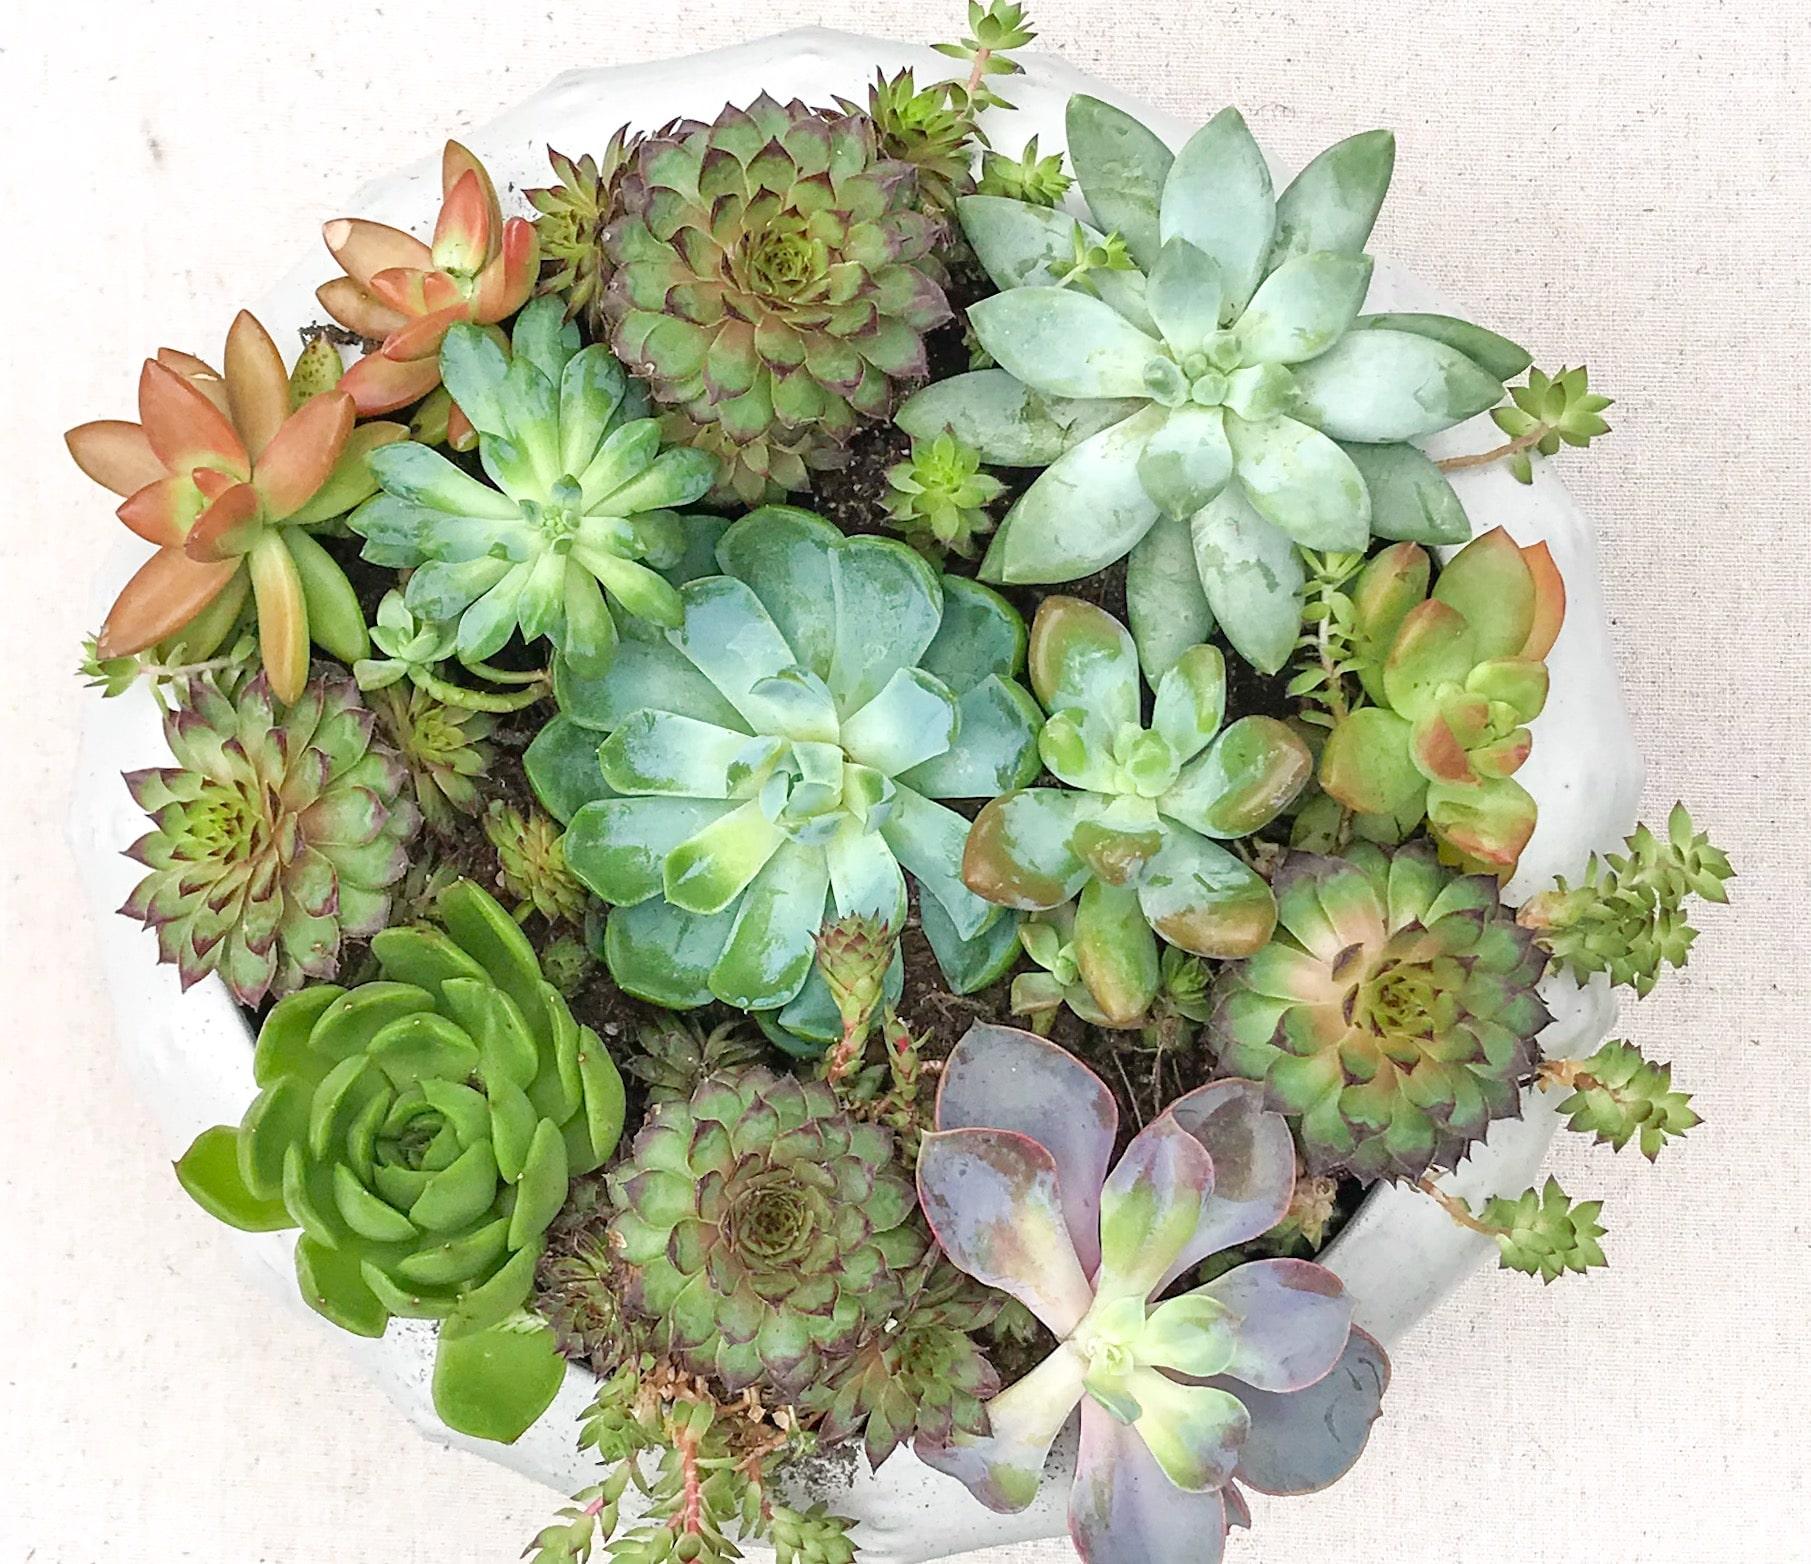 How to Plant Succulents for a Beautiful Arrangement